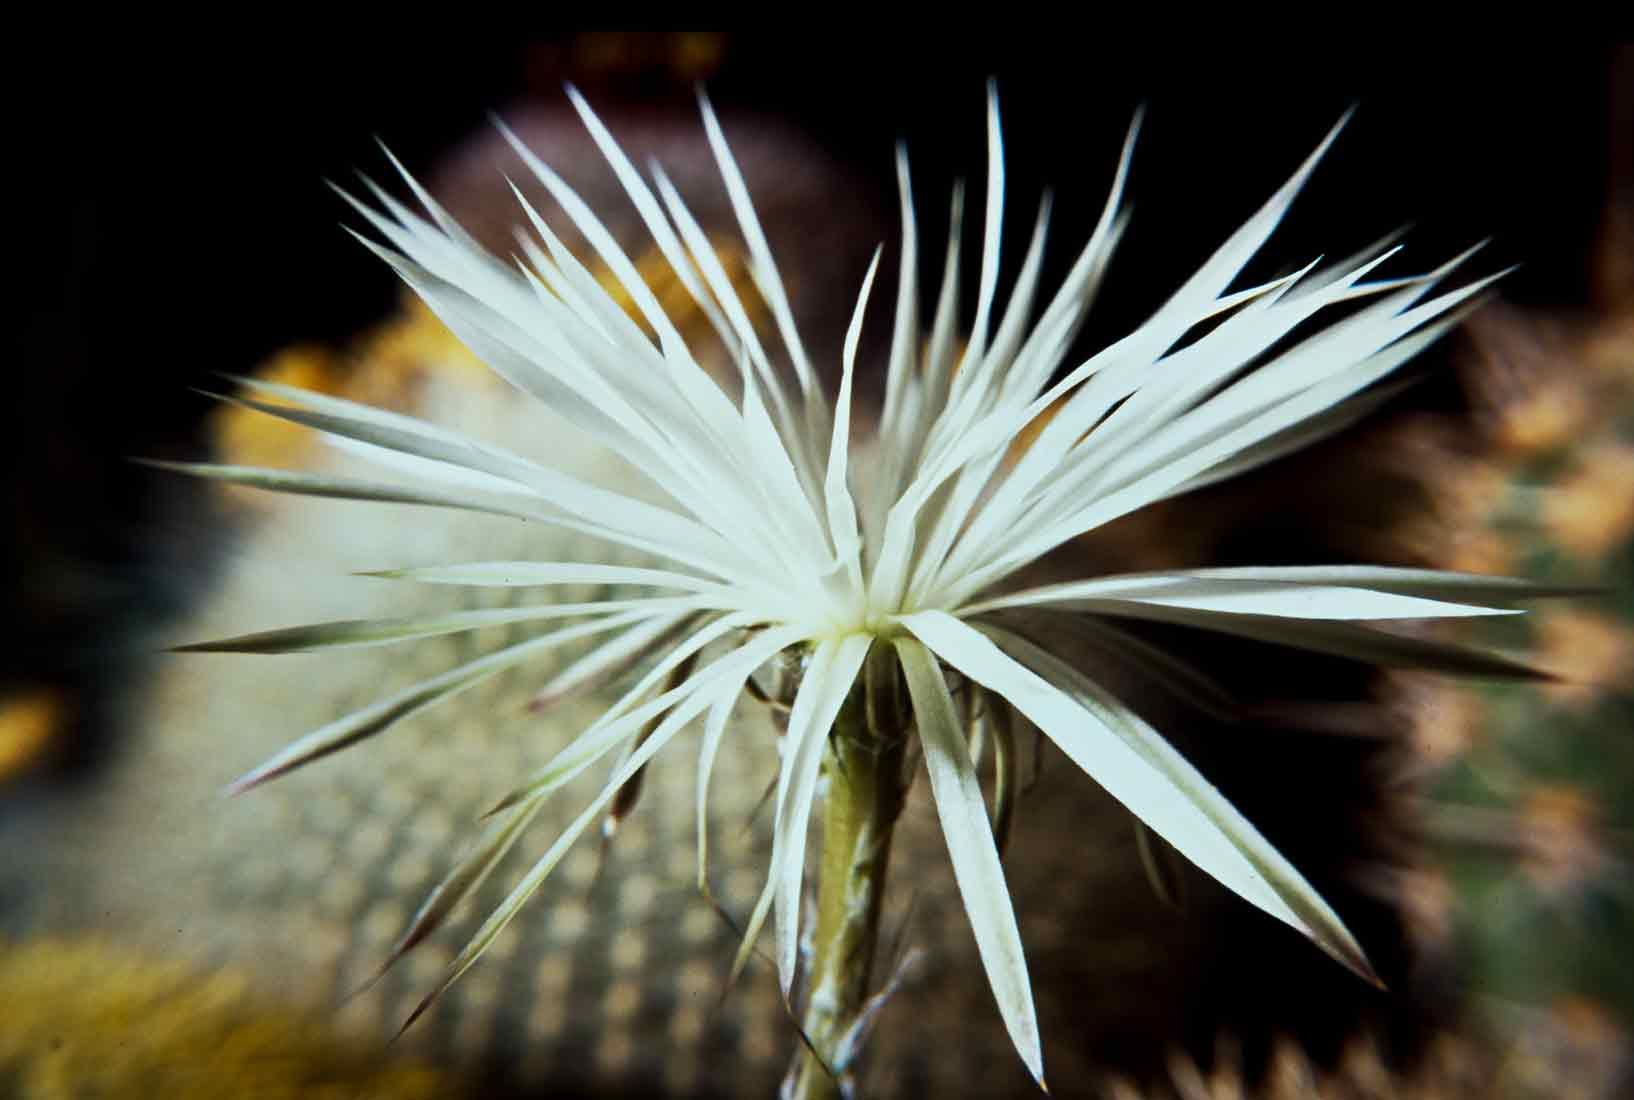 Setiechinopsis mirabilis 1989